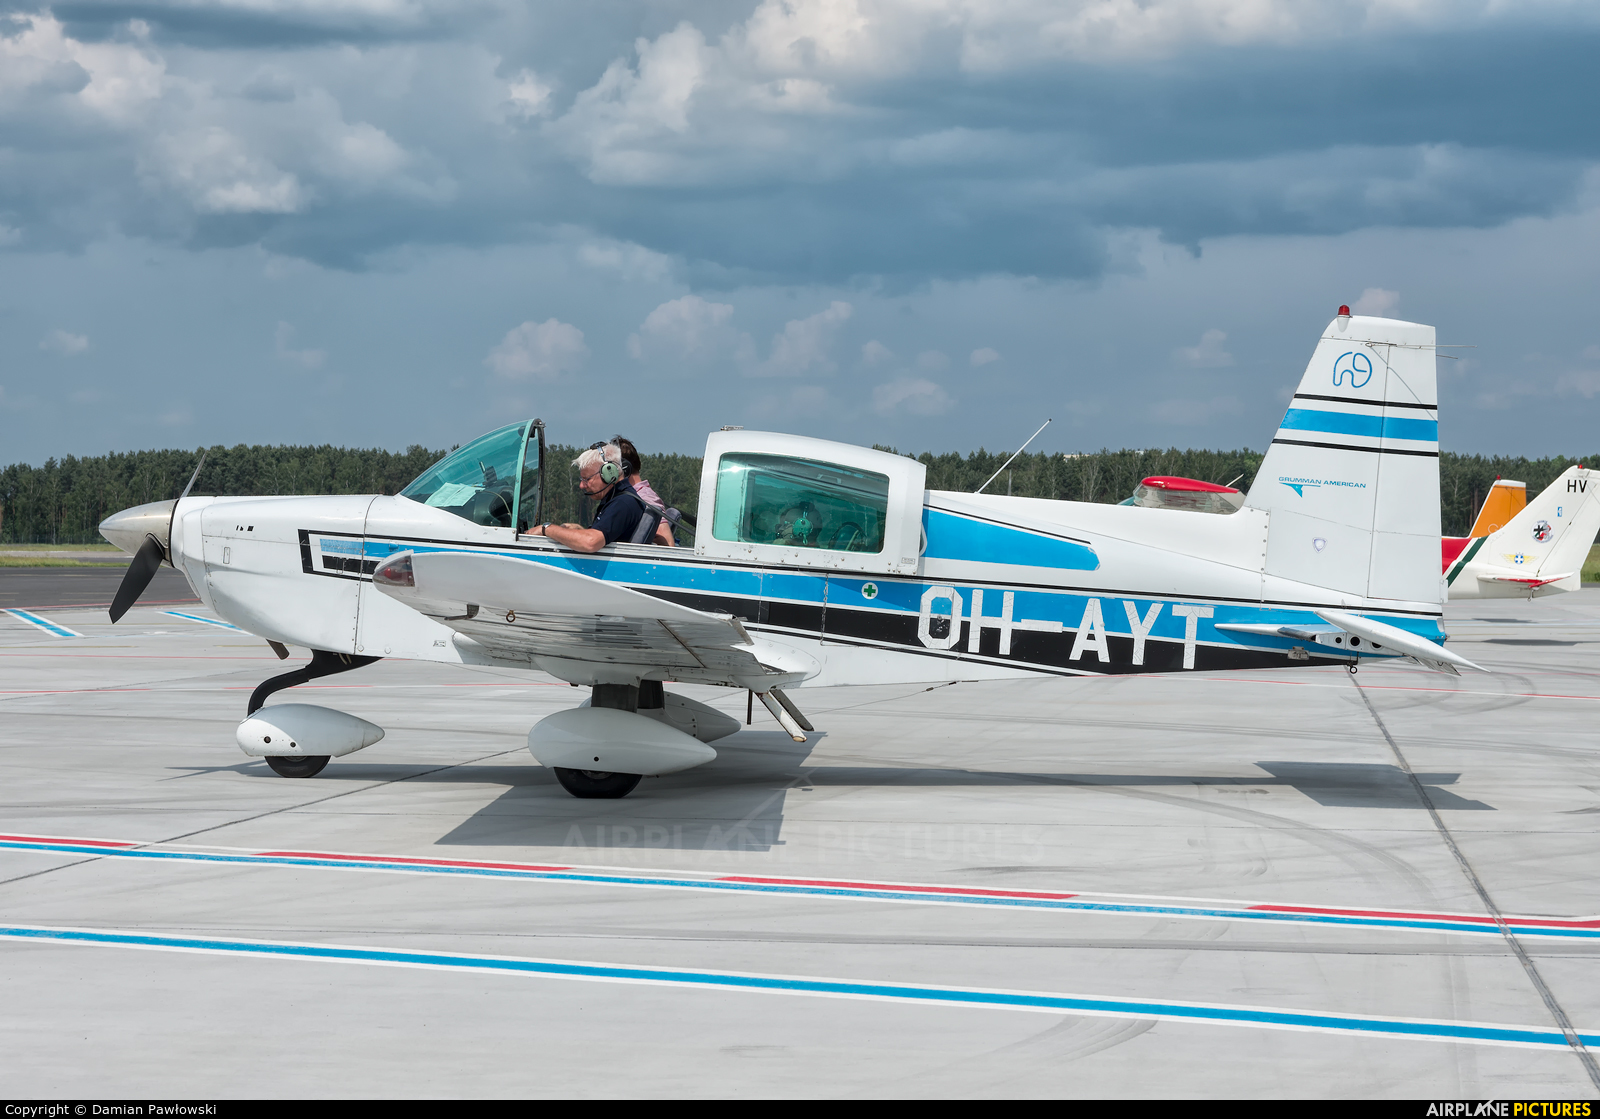 OH-AYT - Private Grumman American AA-5B Tiger at Bydgoszcz